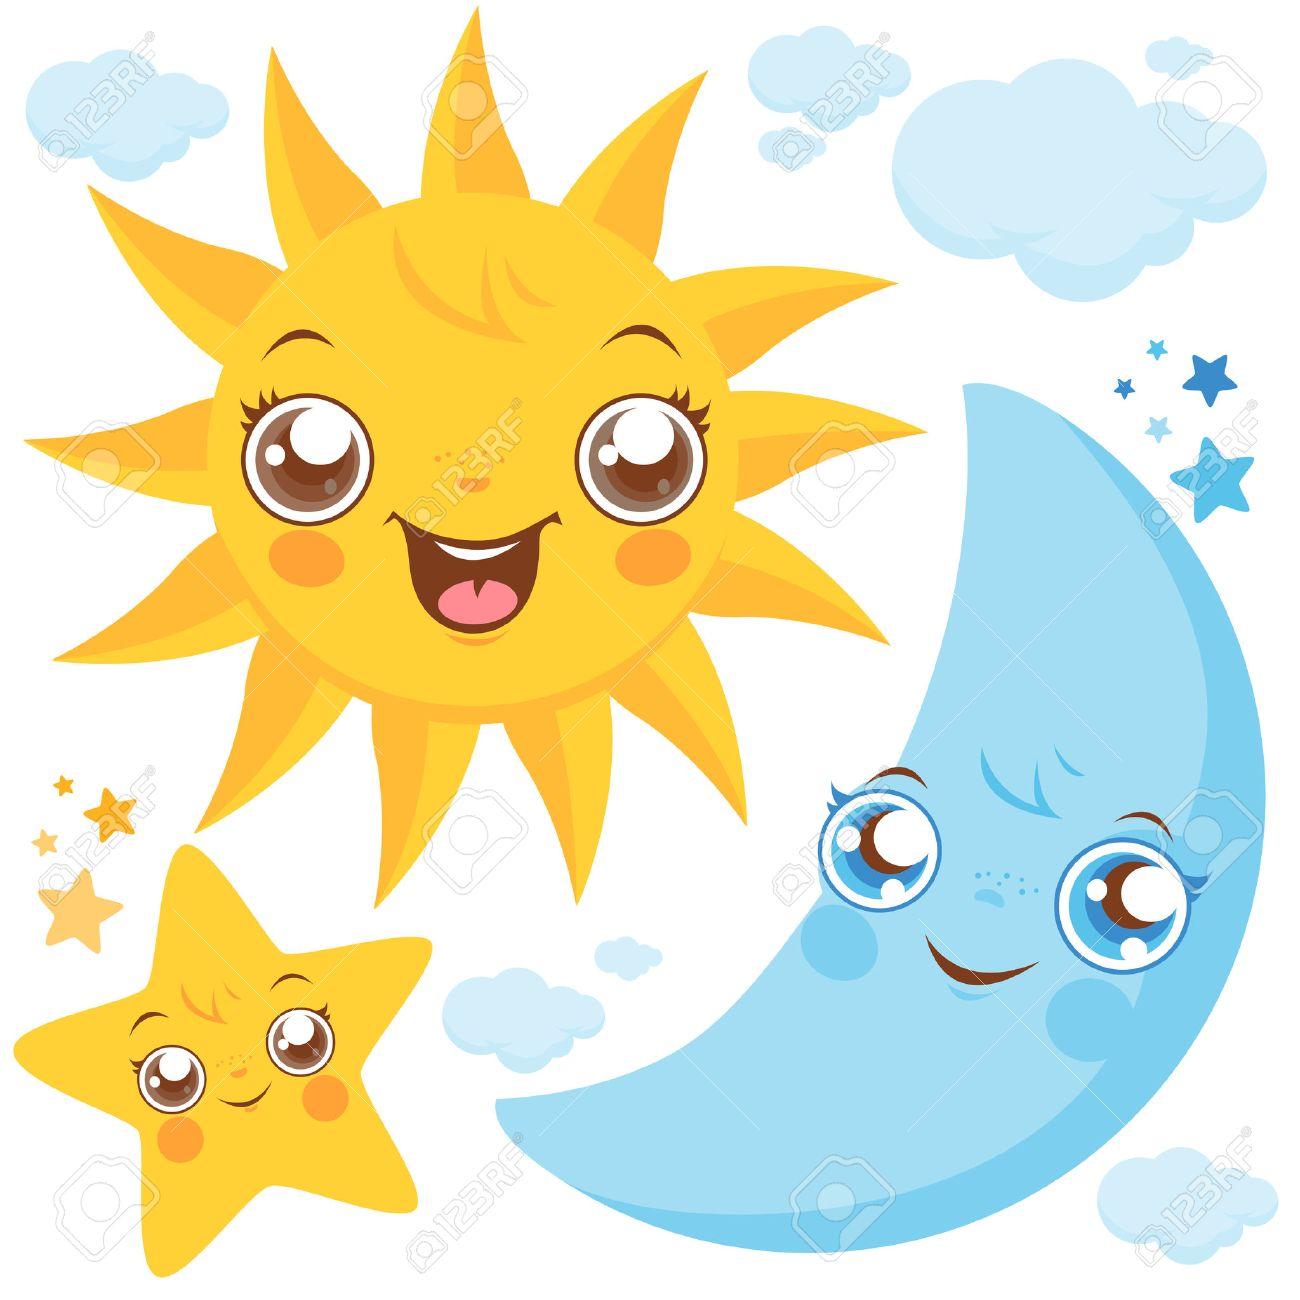 Sun moon and stars - 50050654